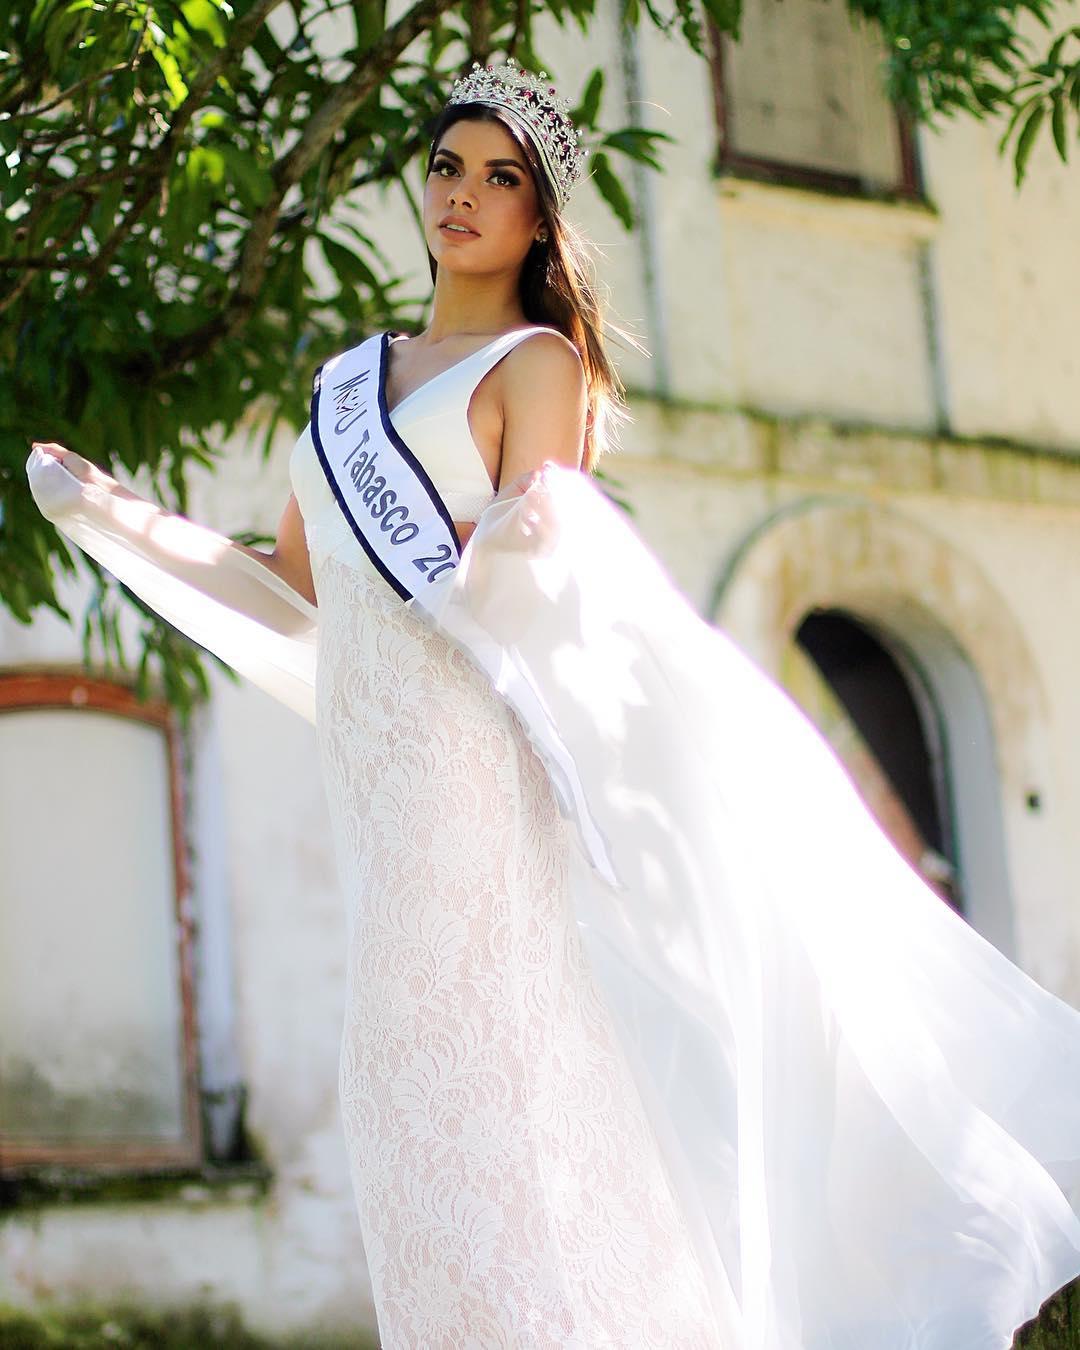 aranza molina, 1 finalista de reyna hispanoamericana 2018. - Página 3 36026410